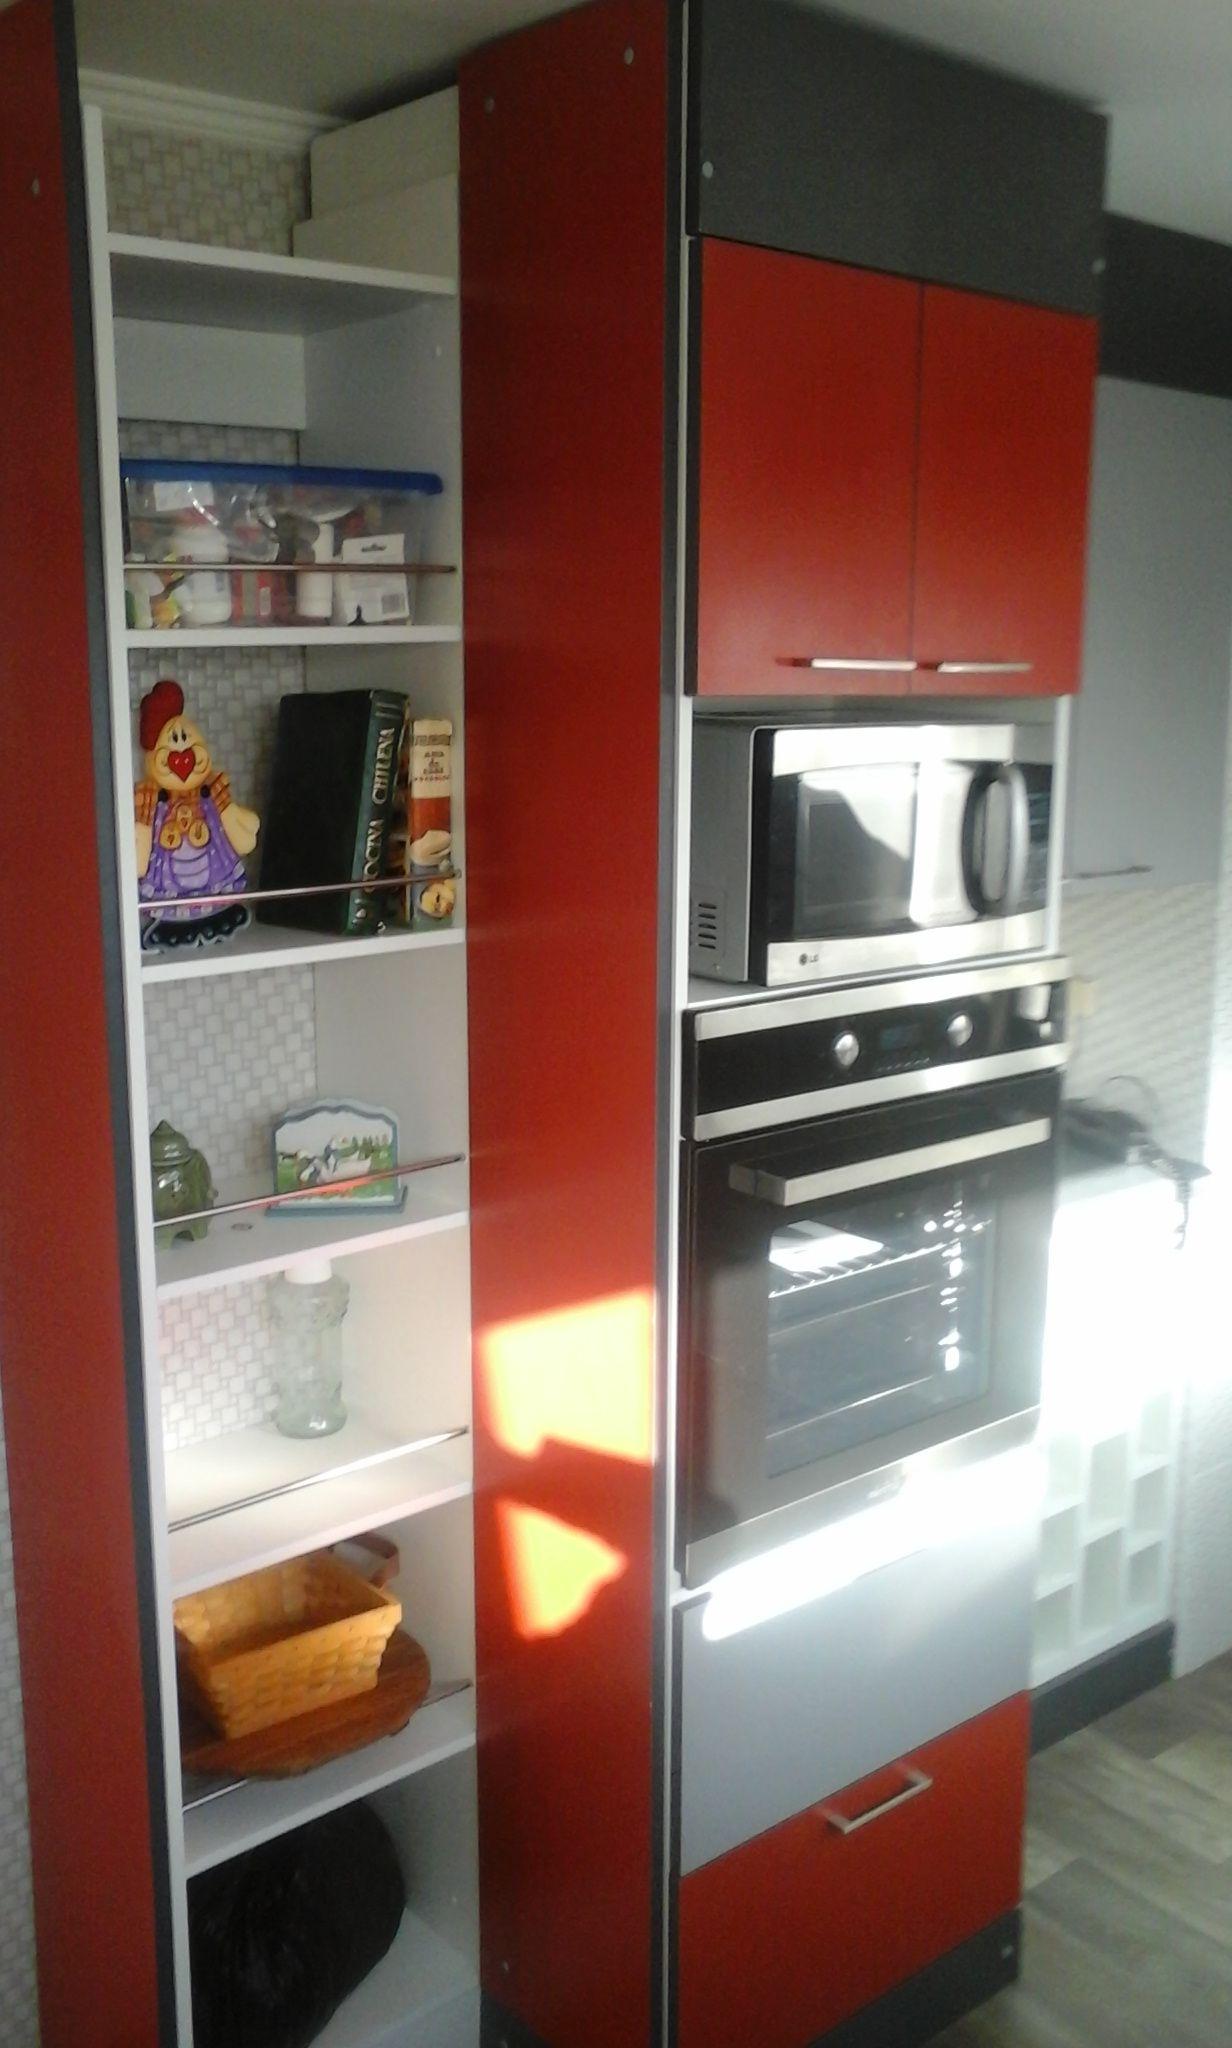 Mueble para horno el ctrico y microondas melamina tono for Hornos de cocina electricos